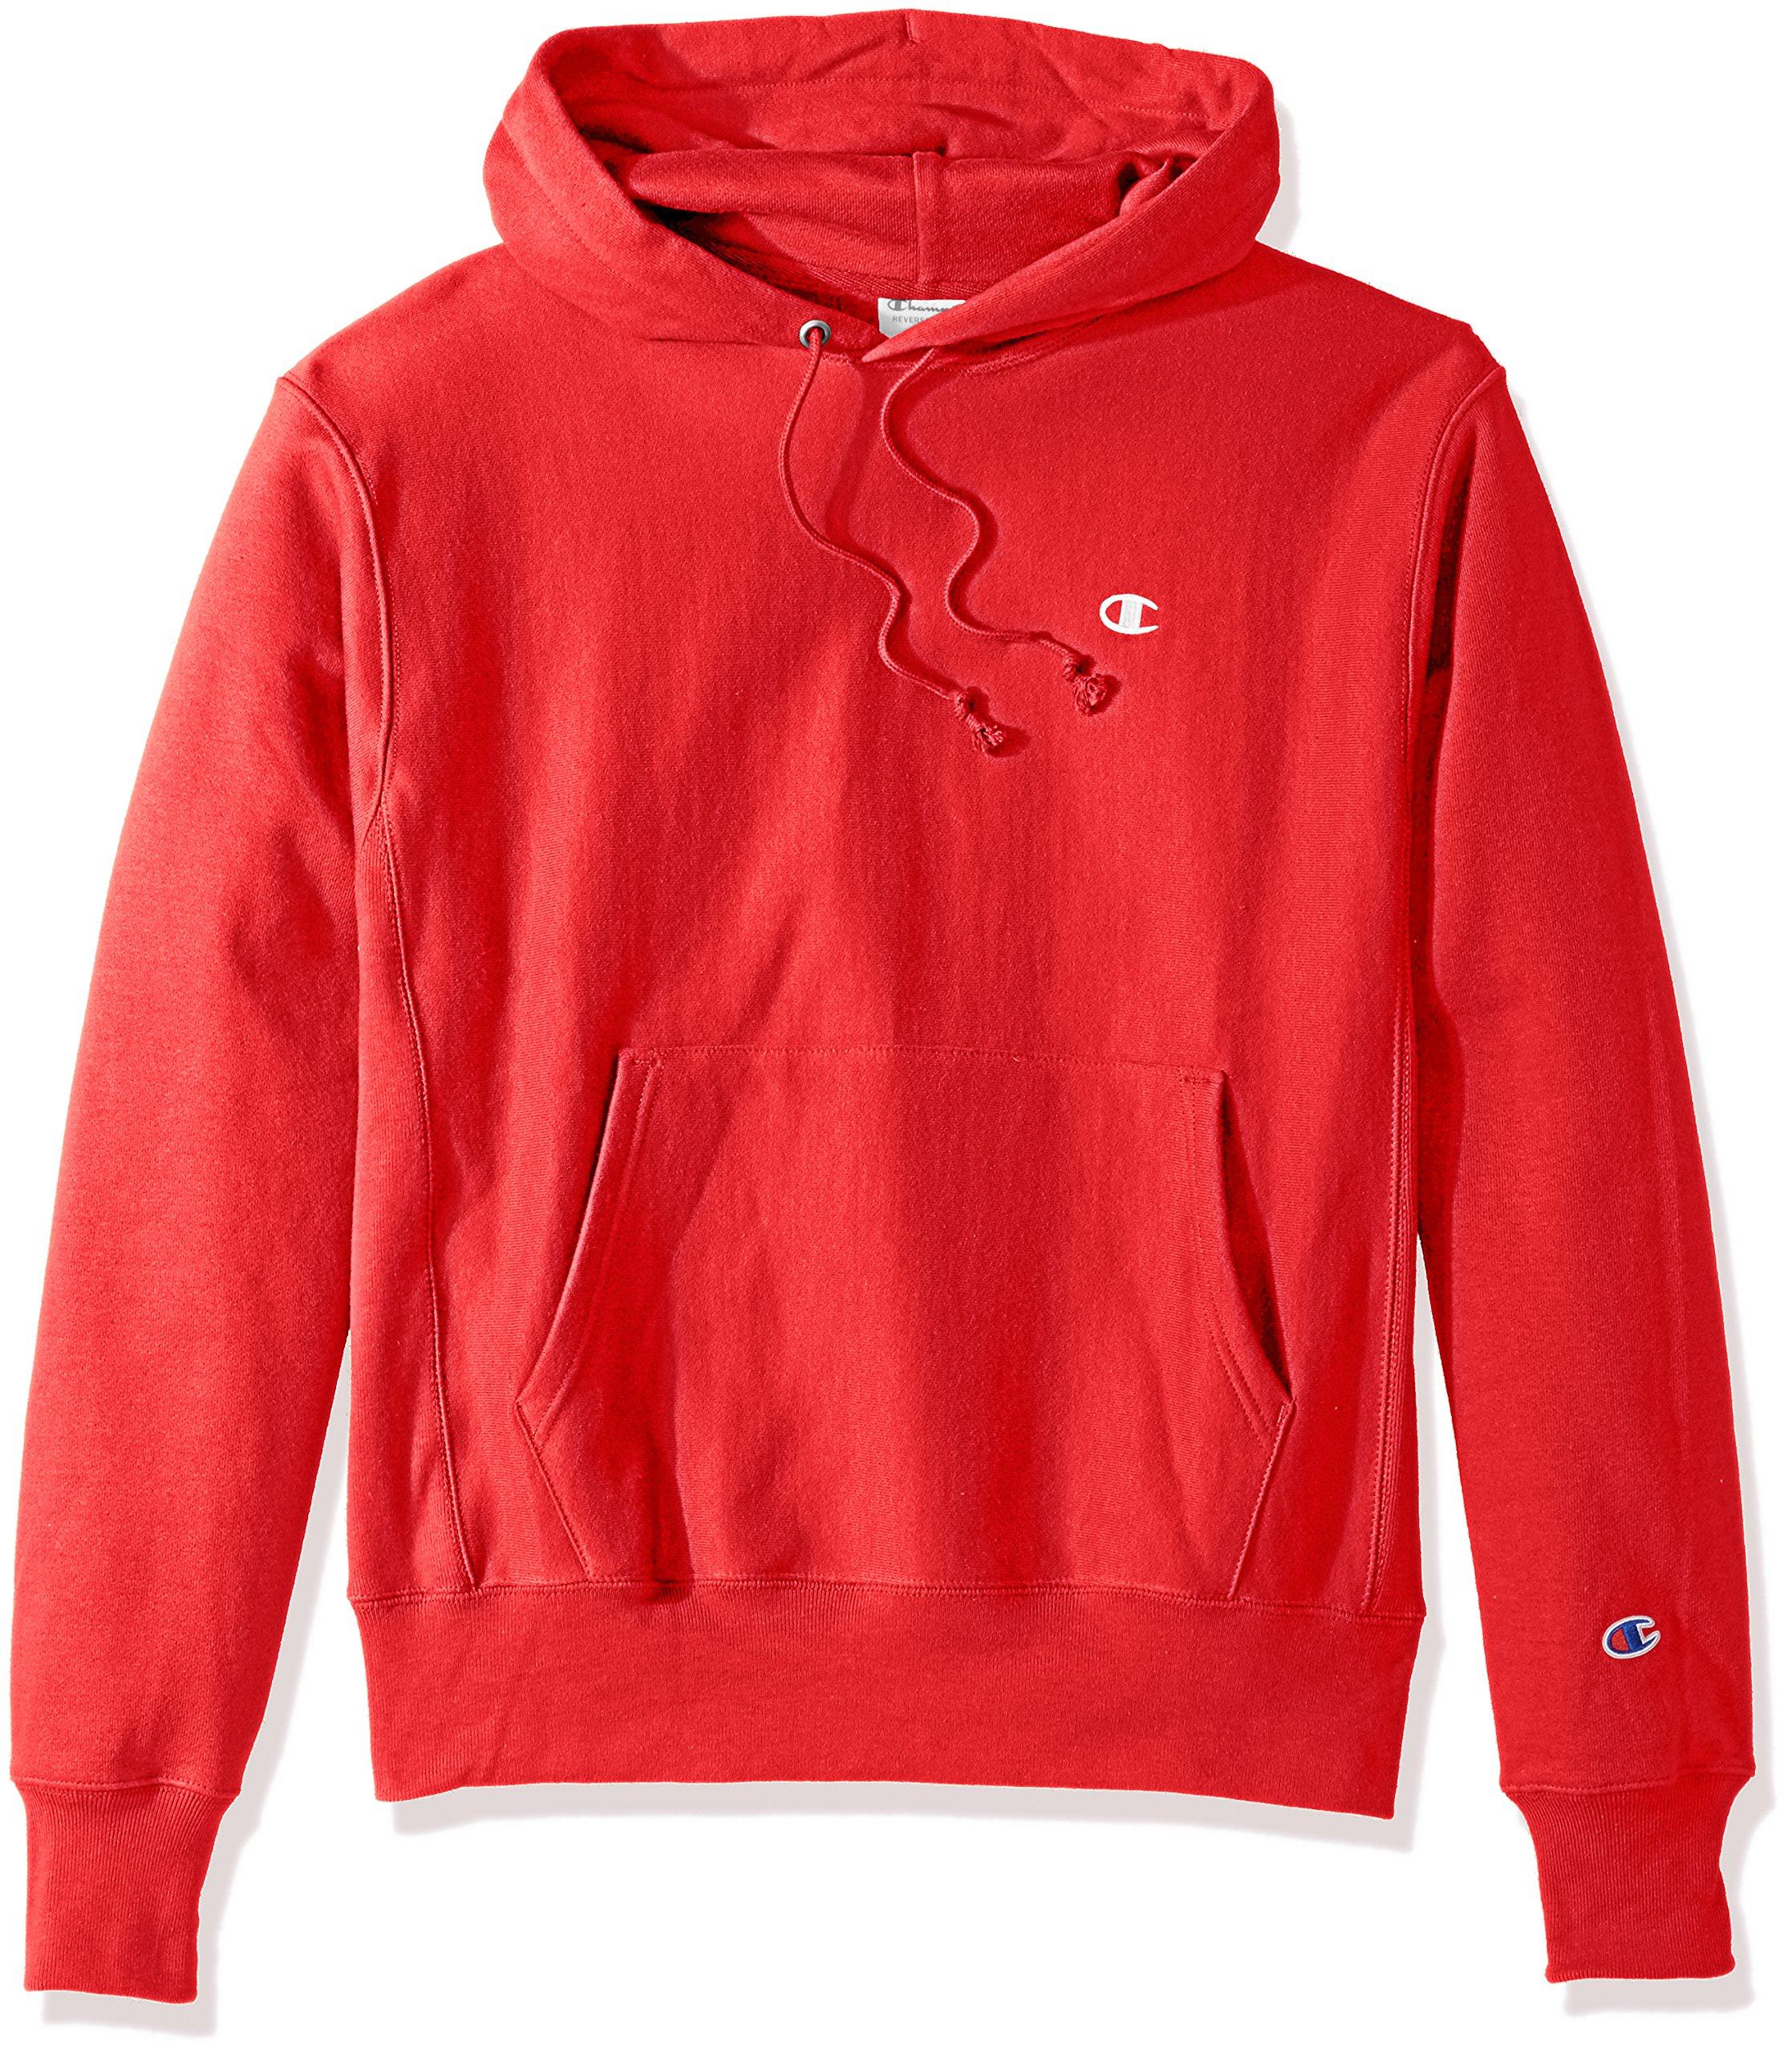 21b5115b Galleon - Champion LIFE Men's Reverse Weave Pullover Hoodie, Team Red  Scarlet/Left Chest C Logo, Medium